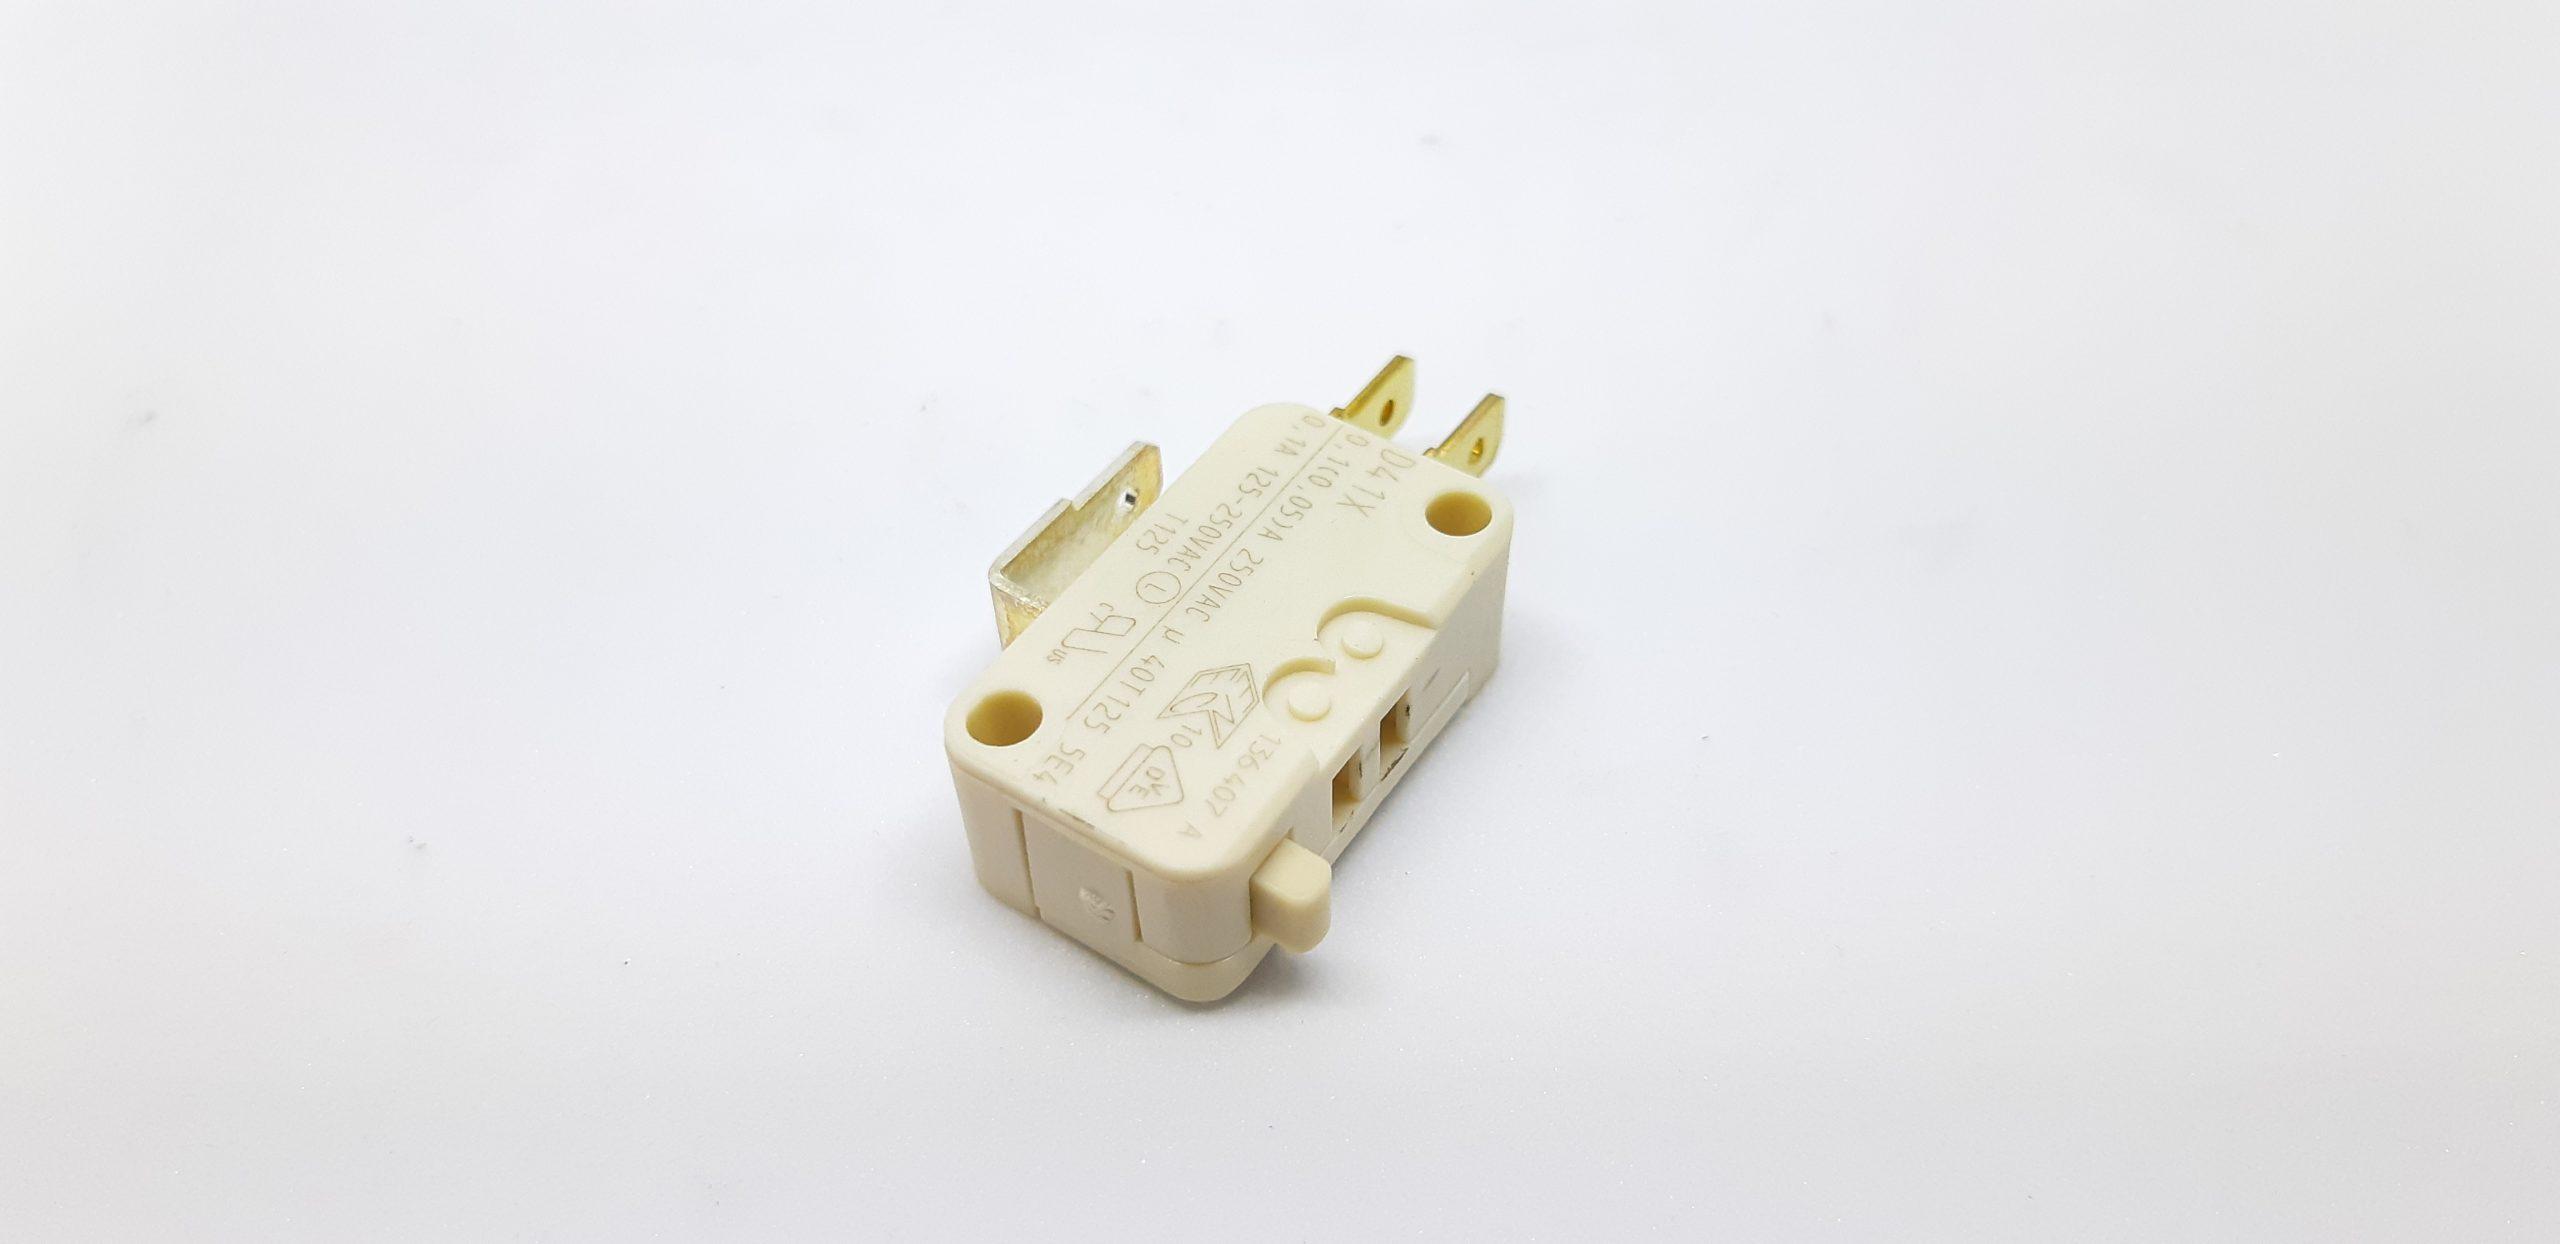 Микроключ редуктор Melitta - 6556181